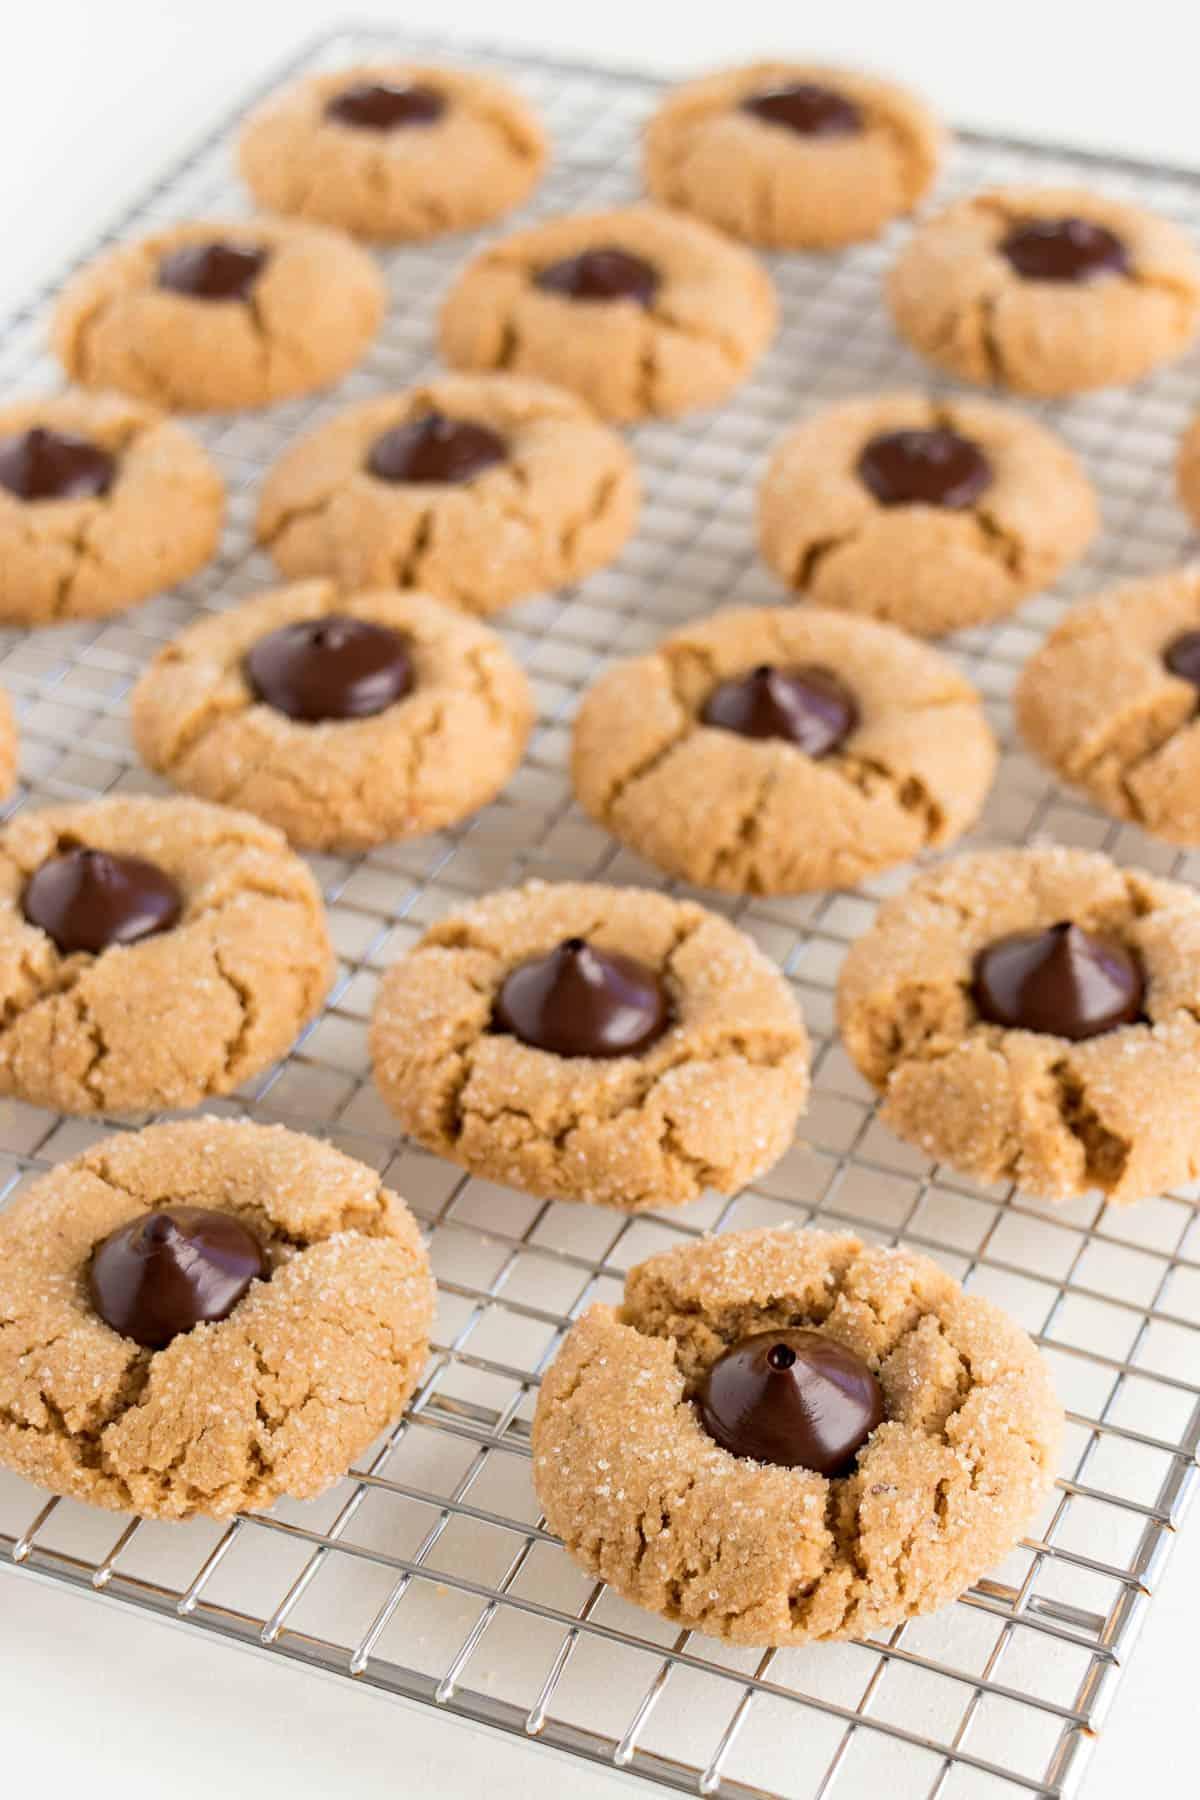 vegan peanut butter thumbprint cookies on a metal cooling rack